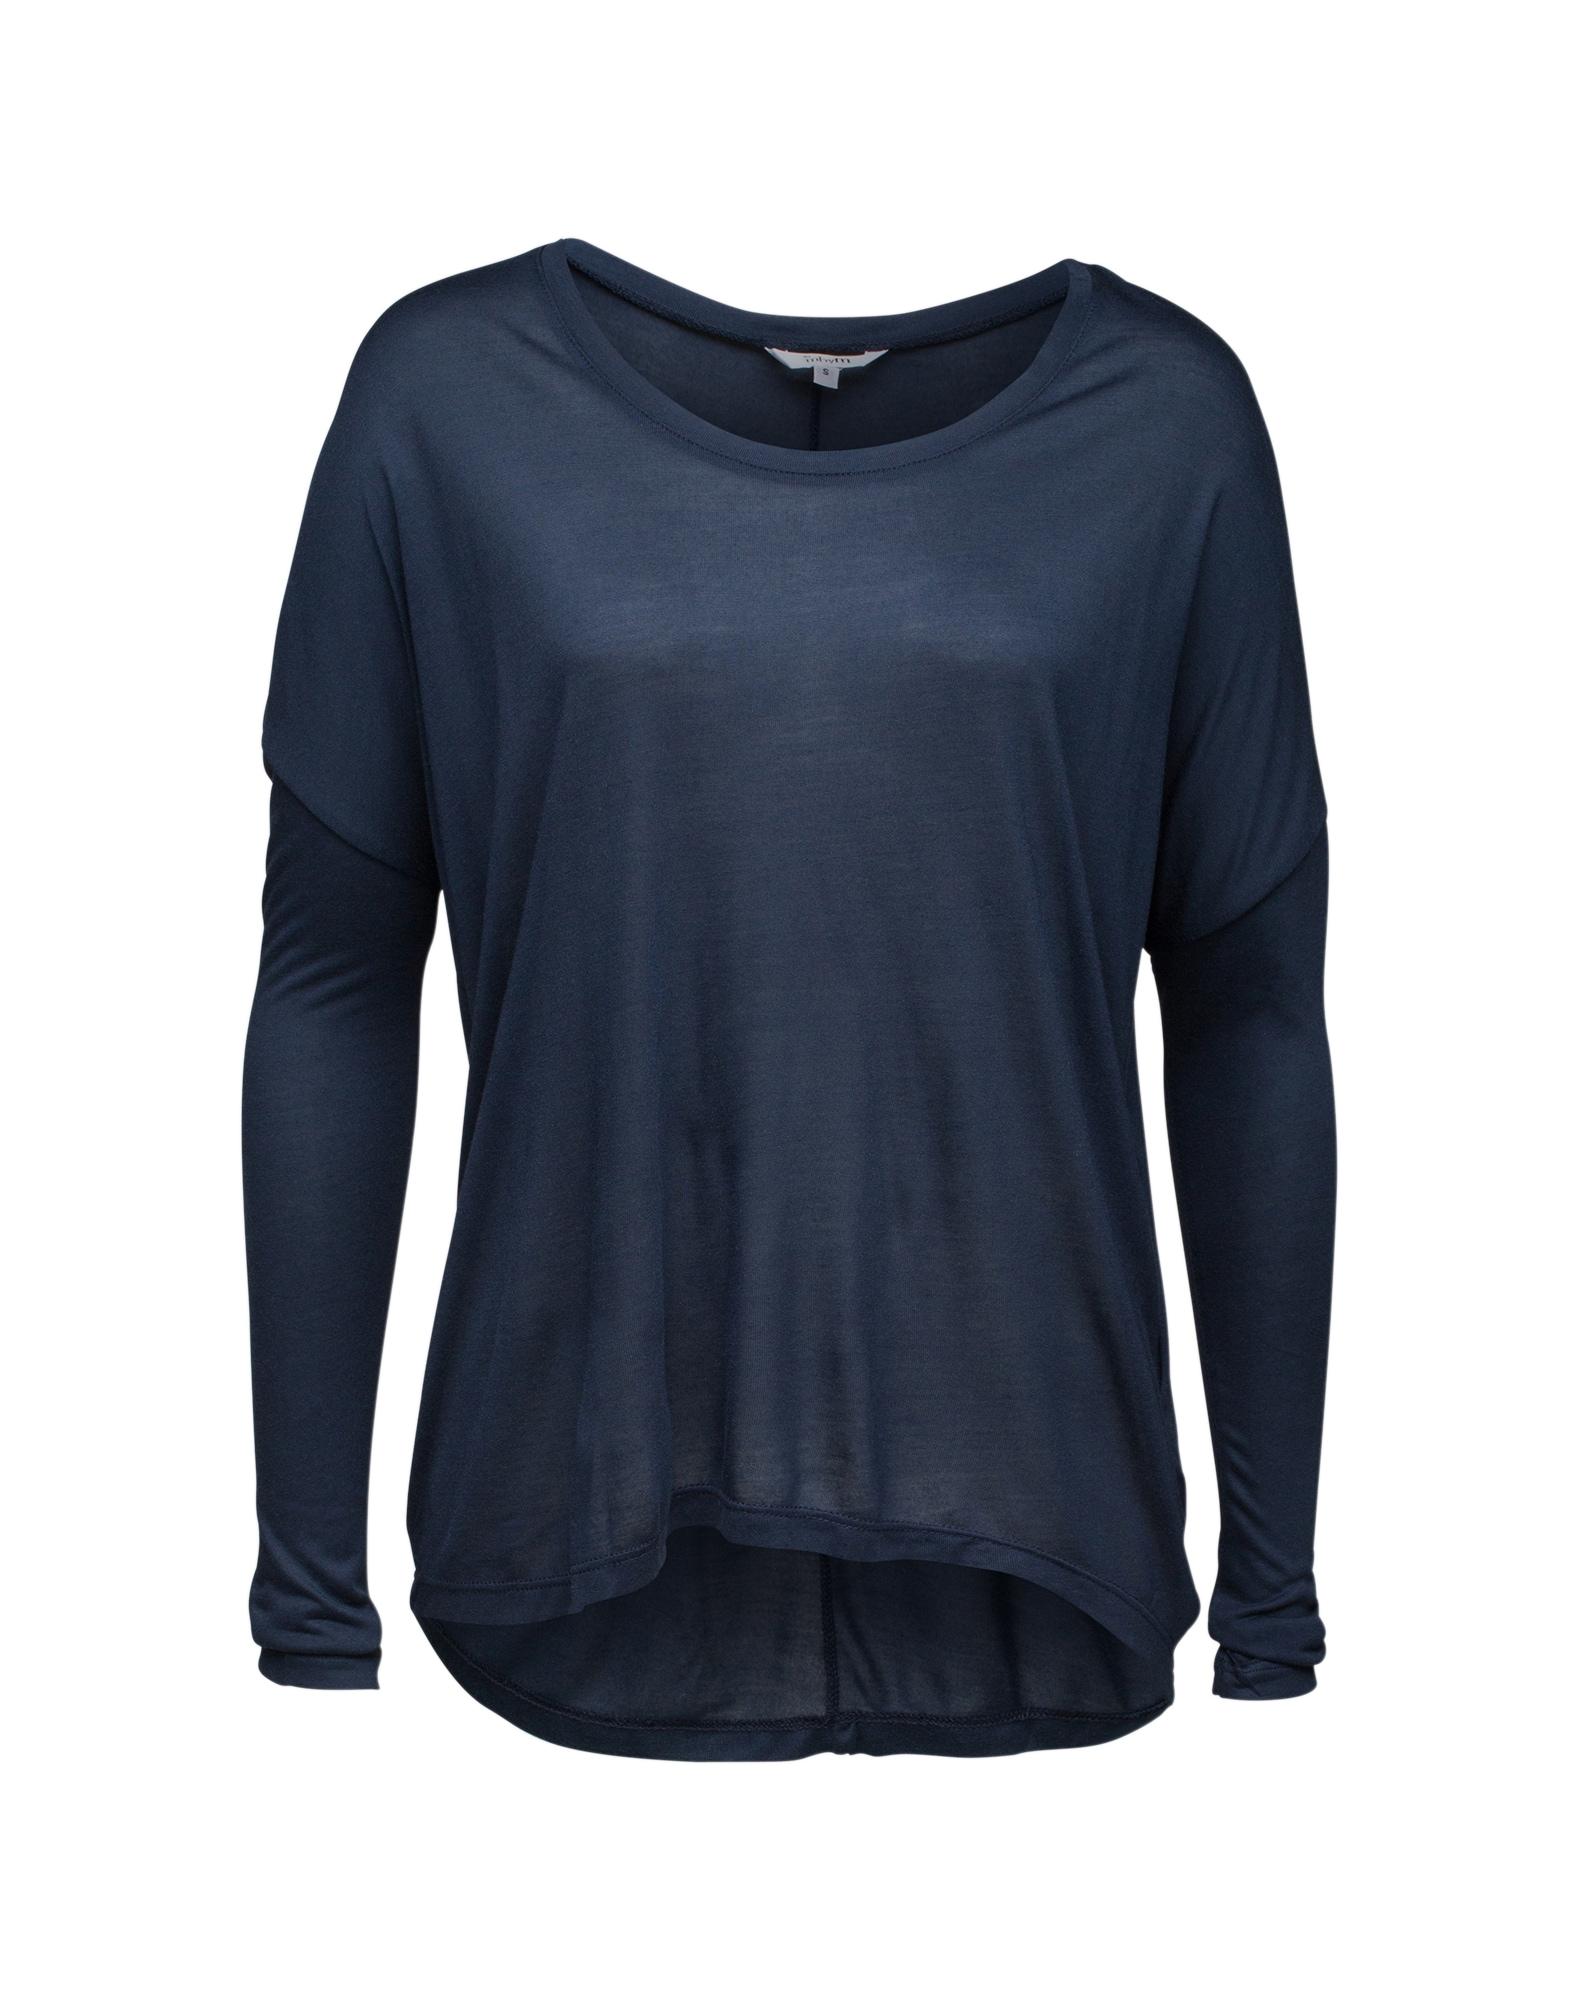 mbym Oversize tričko 'Petrol'  modré / tmavomodrá